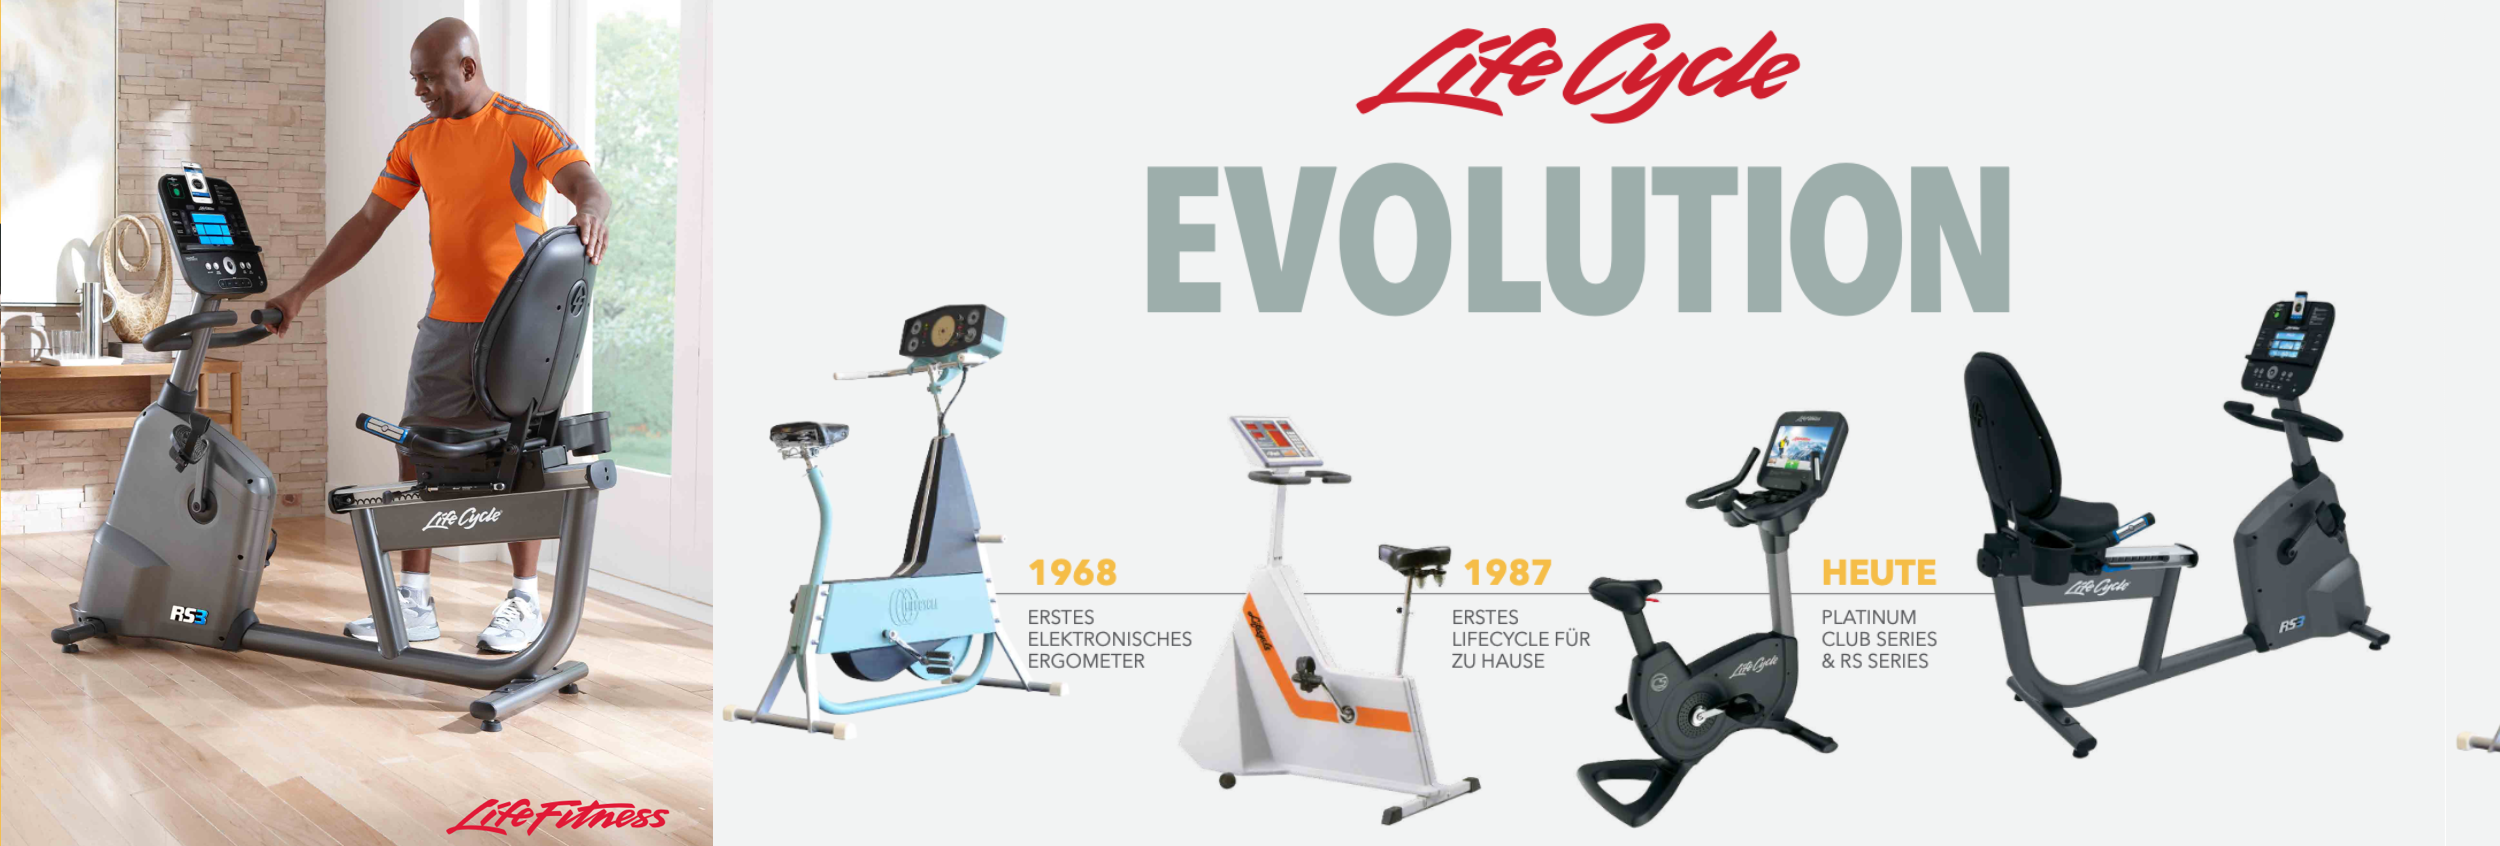 Ergometer-Life-Fitness